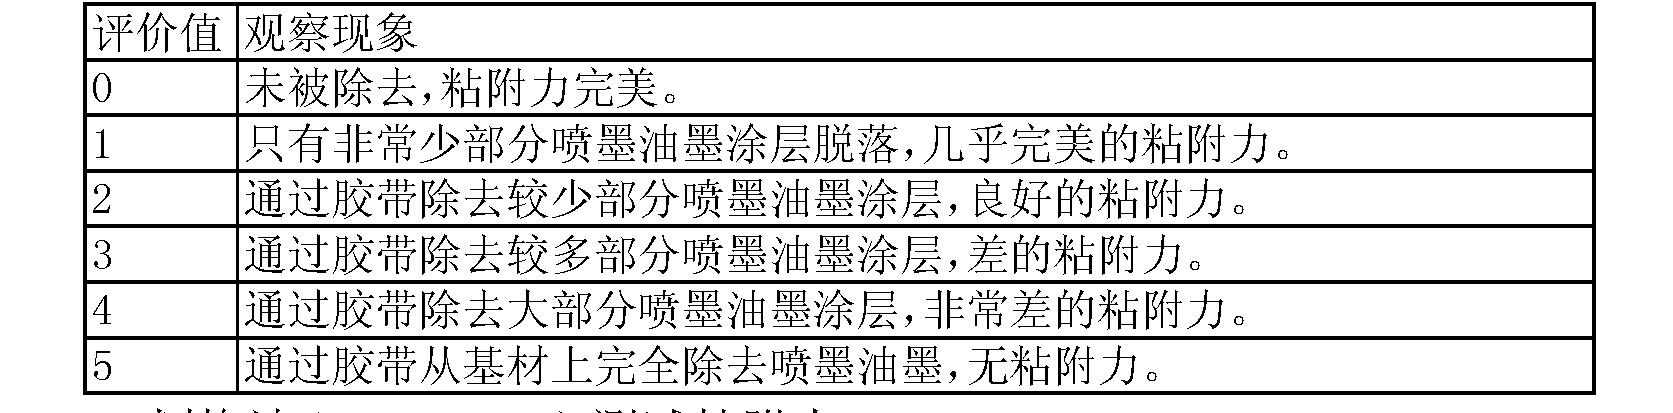 Figure CN104334359AD00211